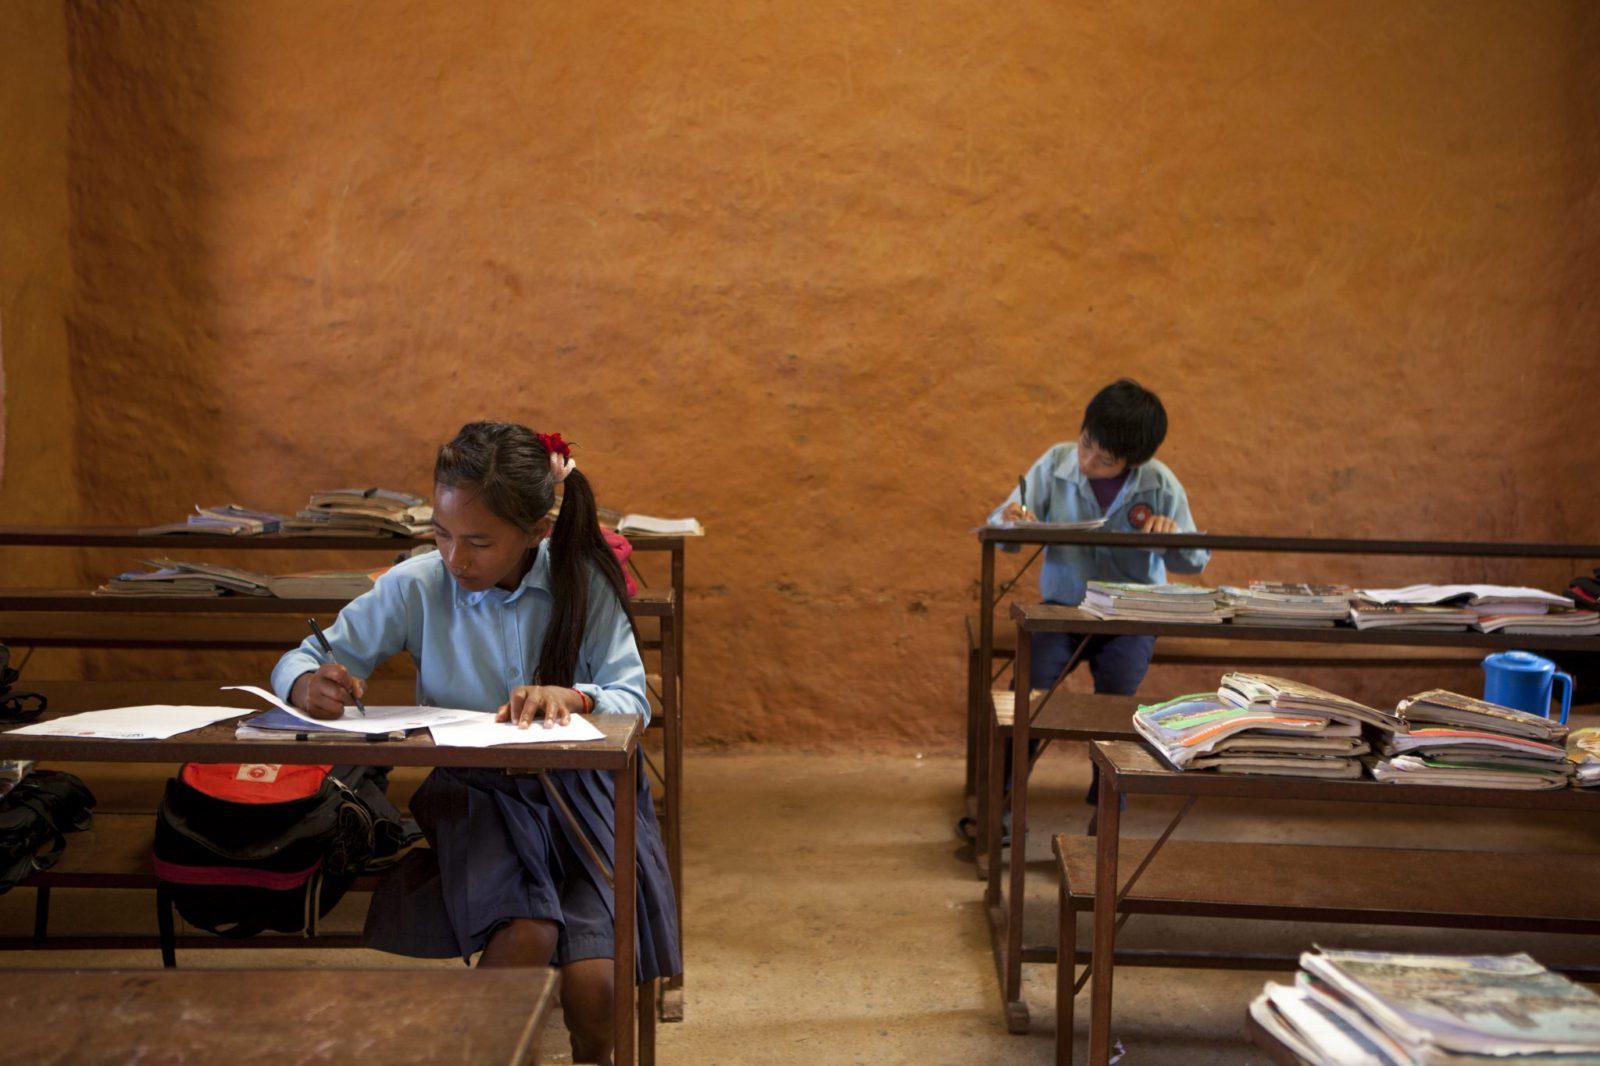 Nepal istruzione 14